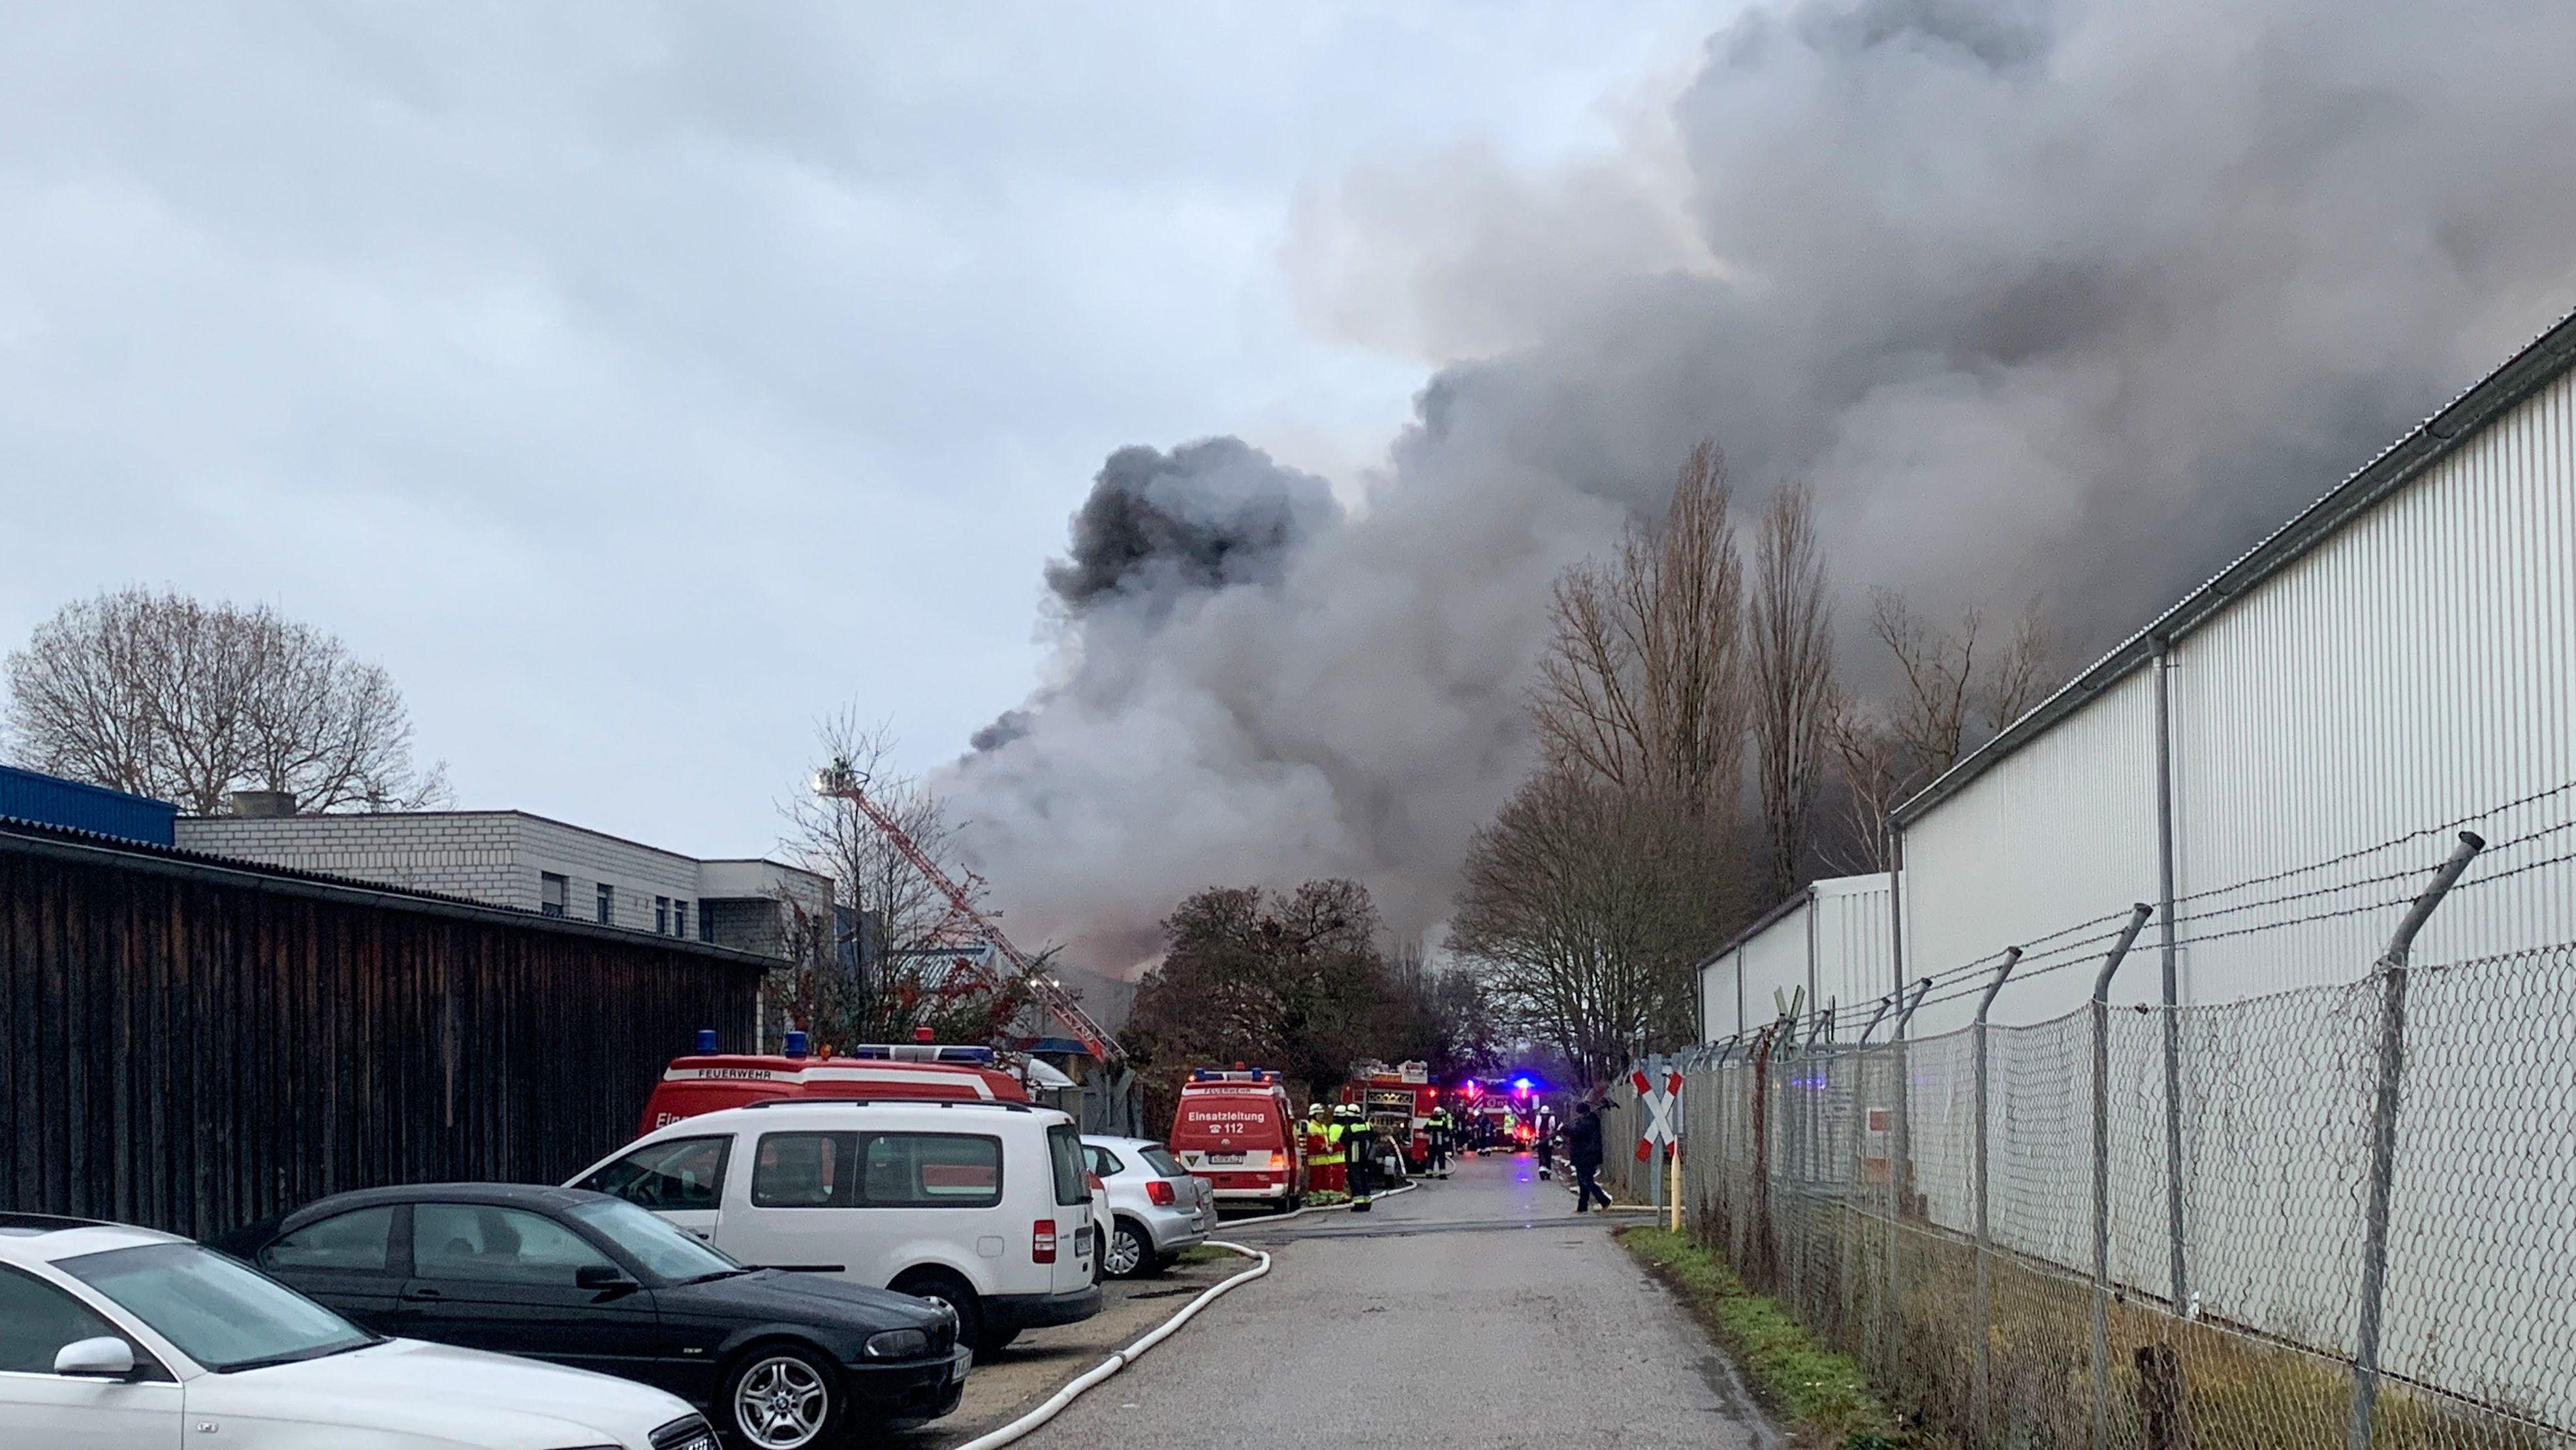 Brand am Rangierbahnhof in Nürnberg